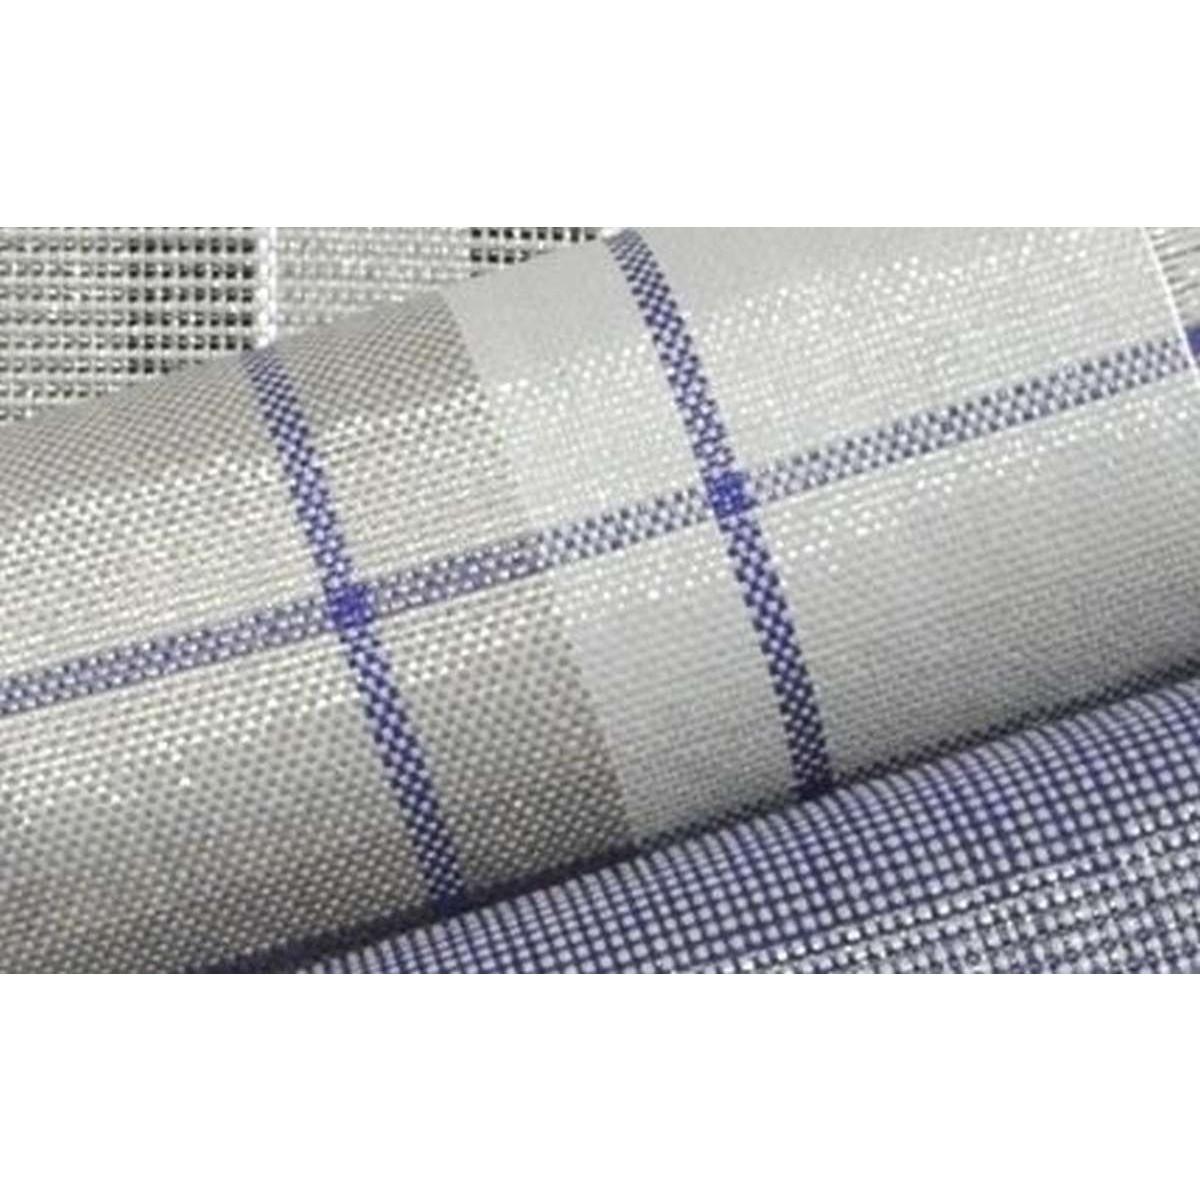 vorzeltteppich safari farbe grau blau. Black Bedroom Furniture Sets. Home Design Ideas